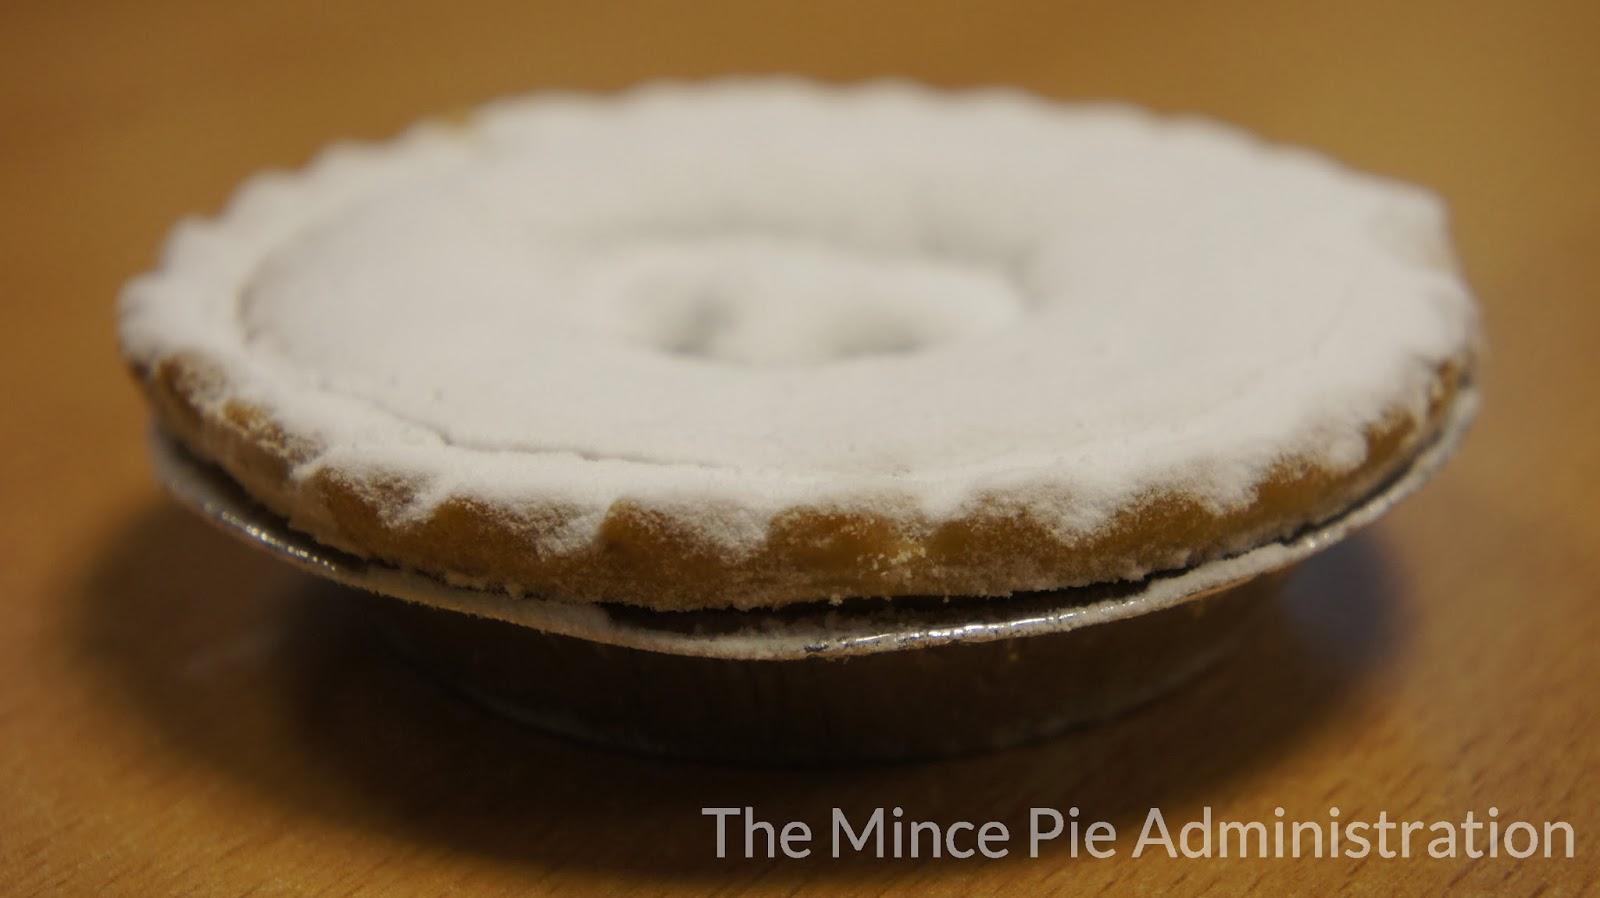 The Mince Pie Administration: Costco - Kirkland Signature - Mince Pies